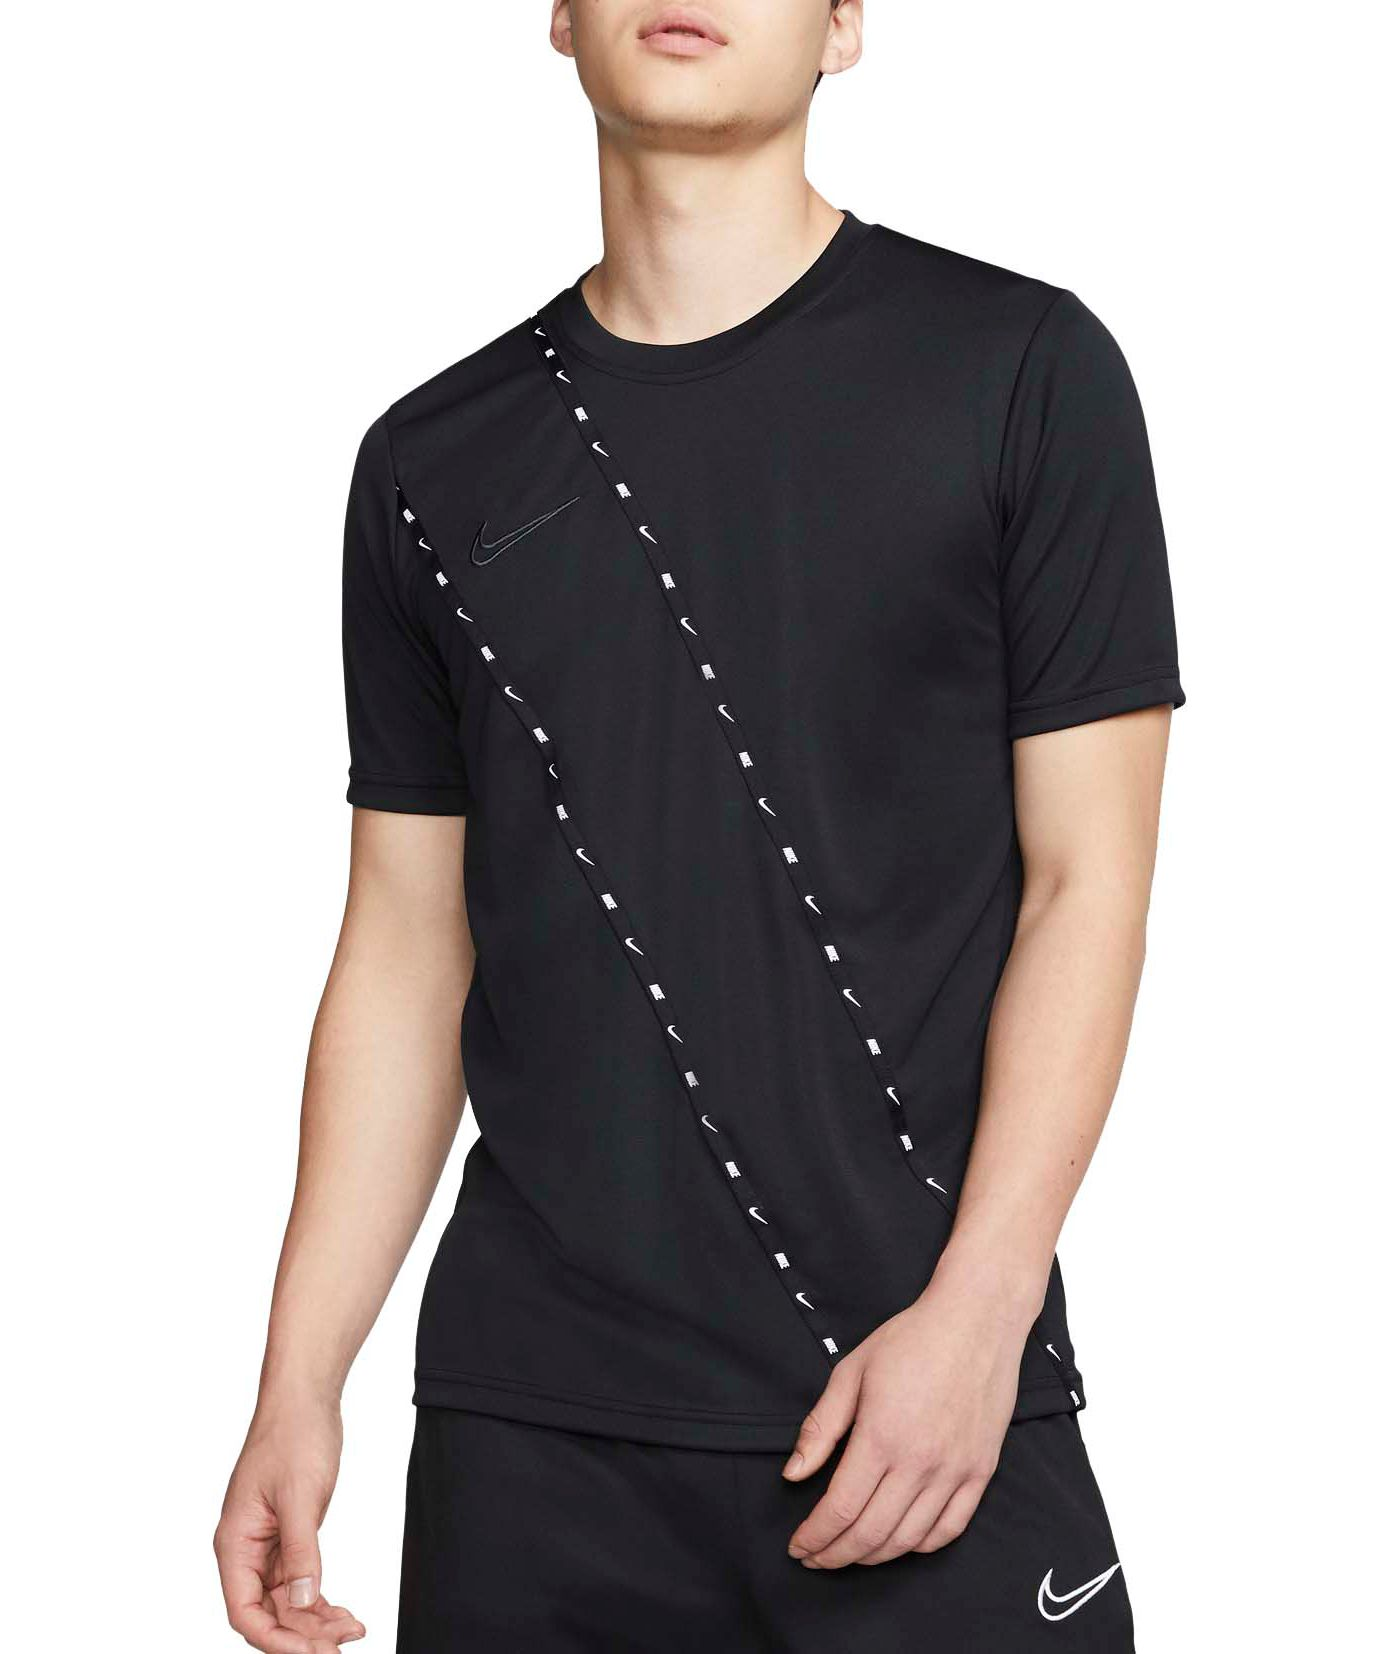 Nike Men's Dry Academy Graphic T-Shirt